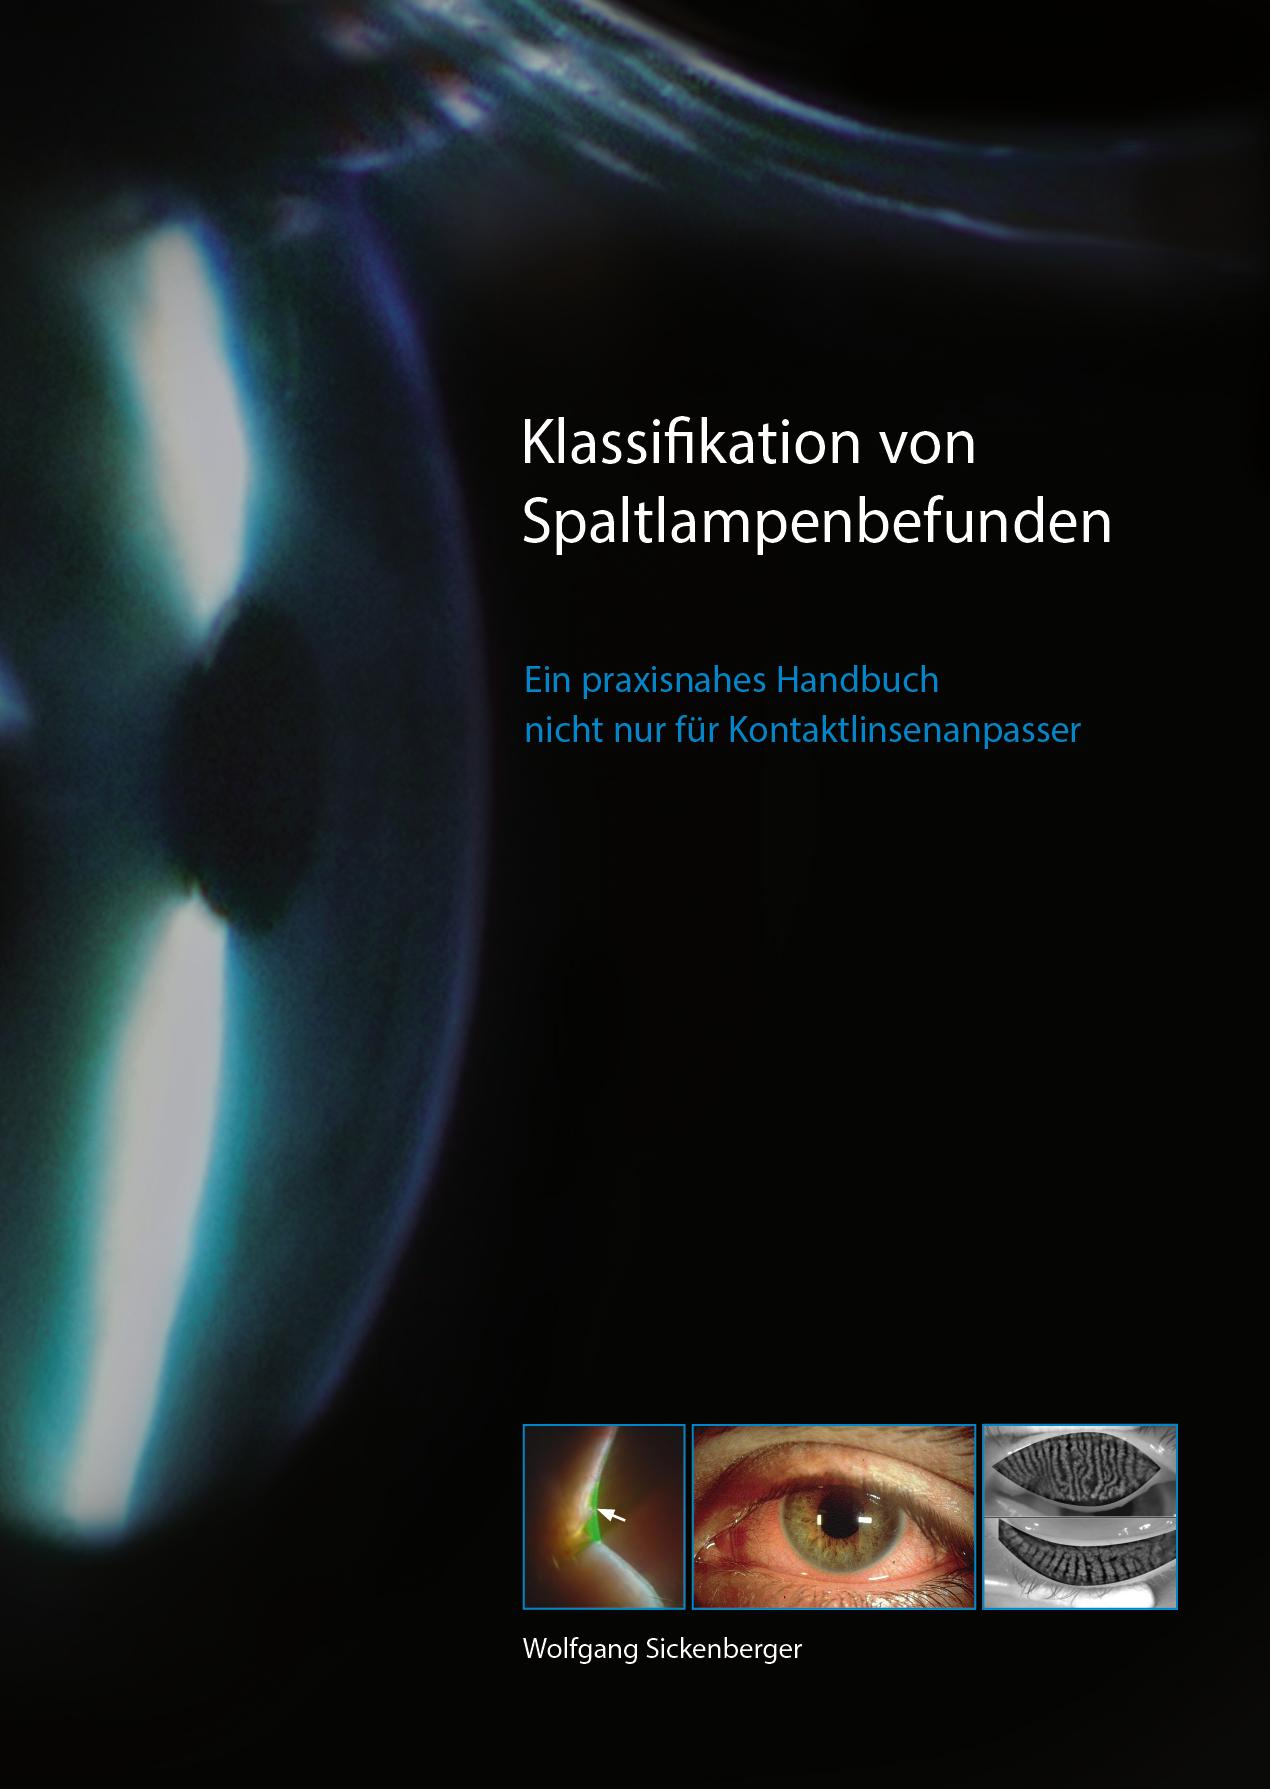 Klassifikation_von_Spaltlampenbefunden_de_VS-01